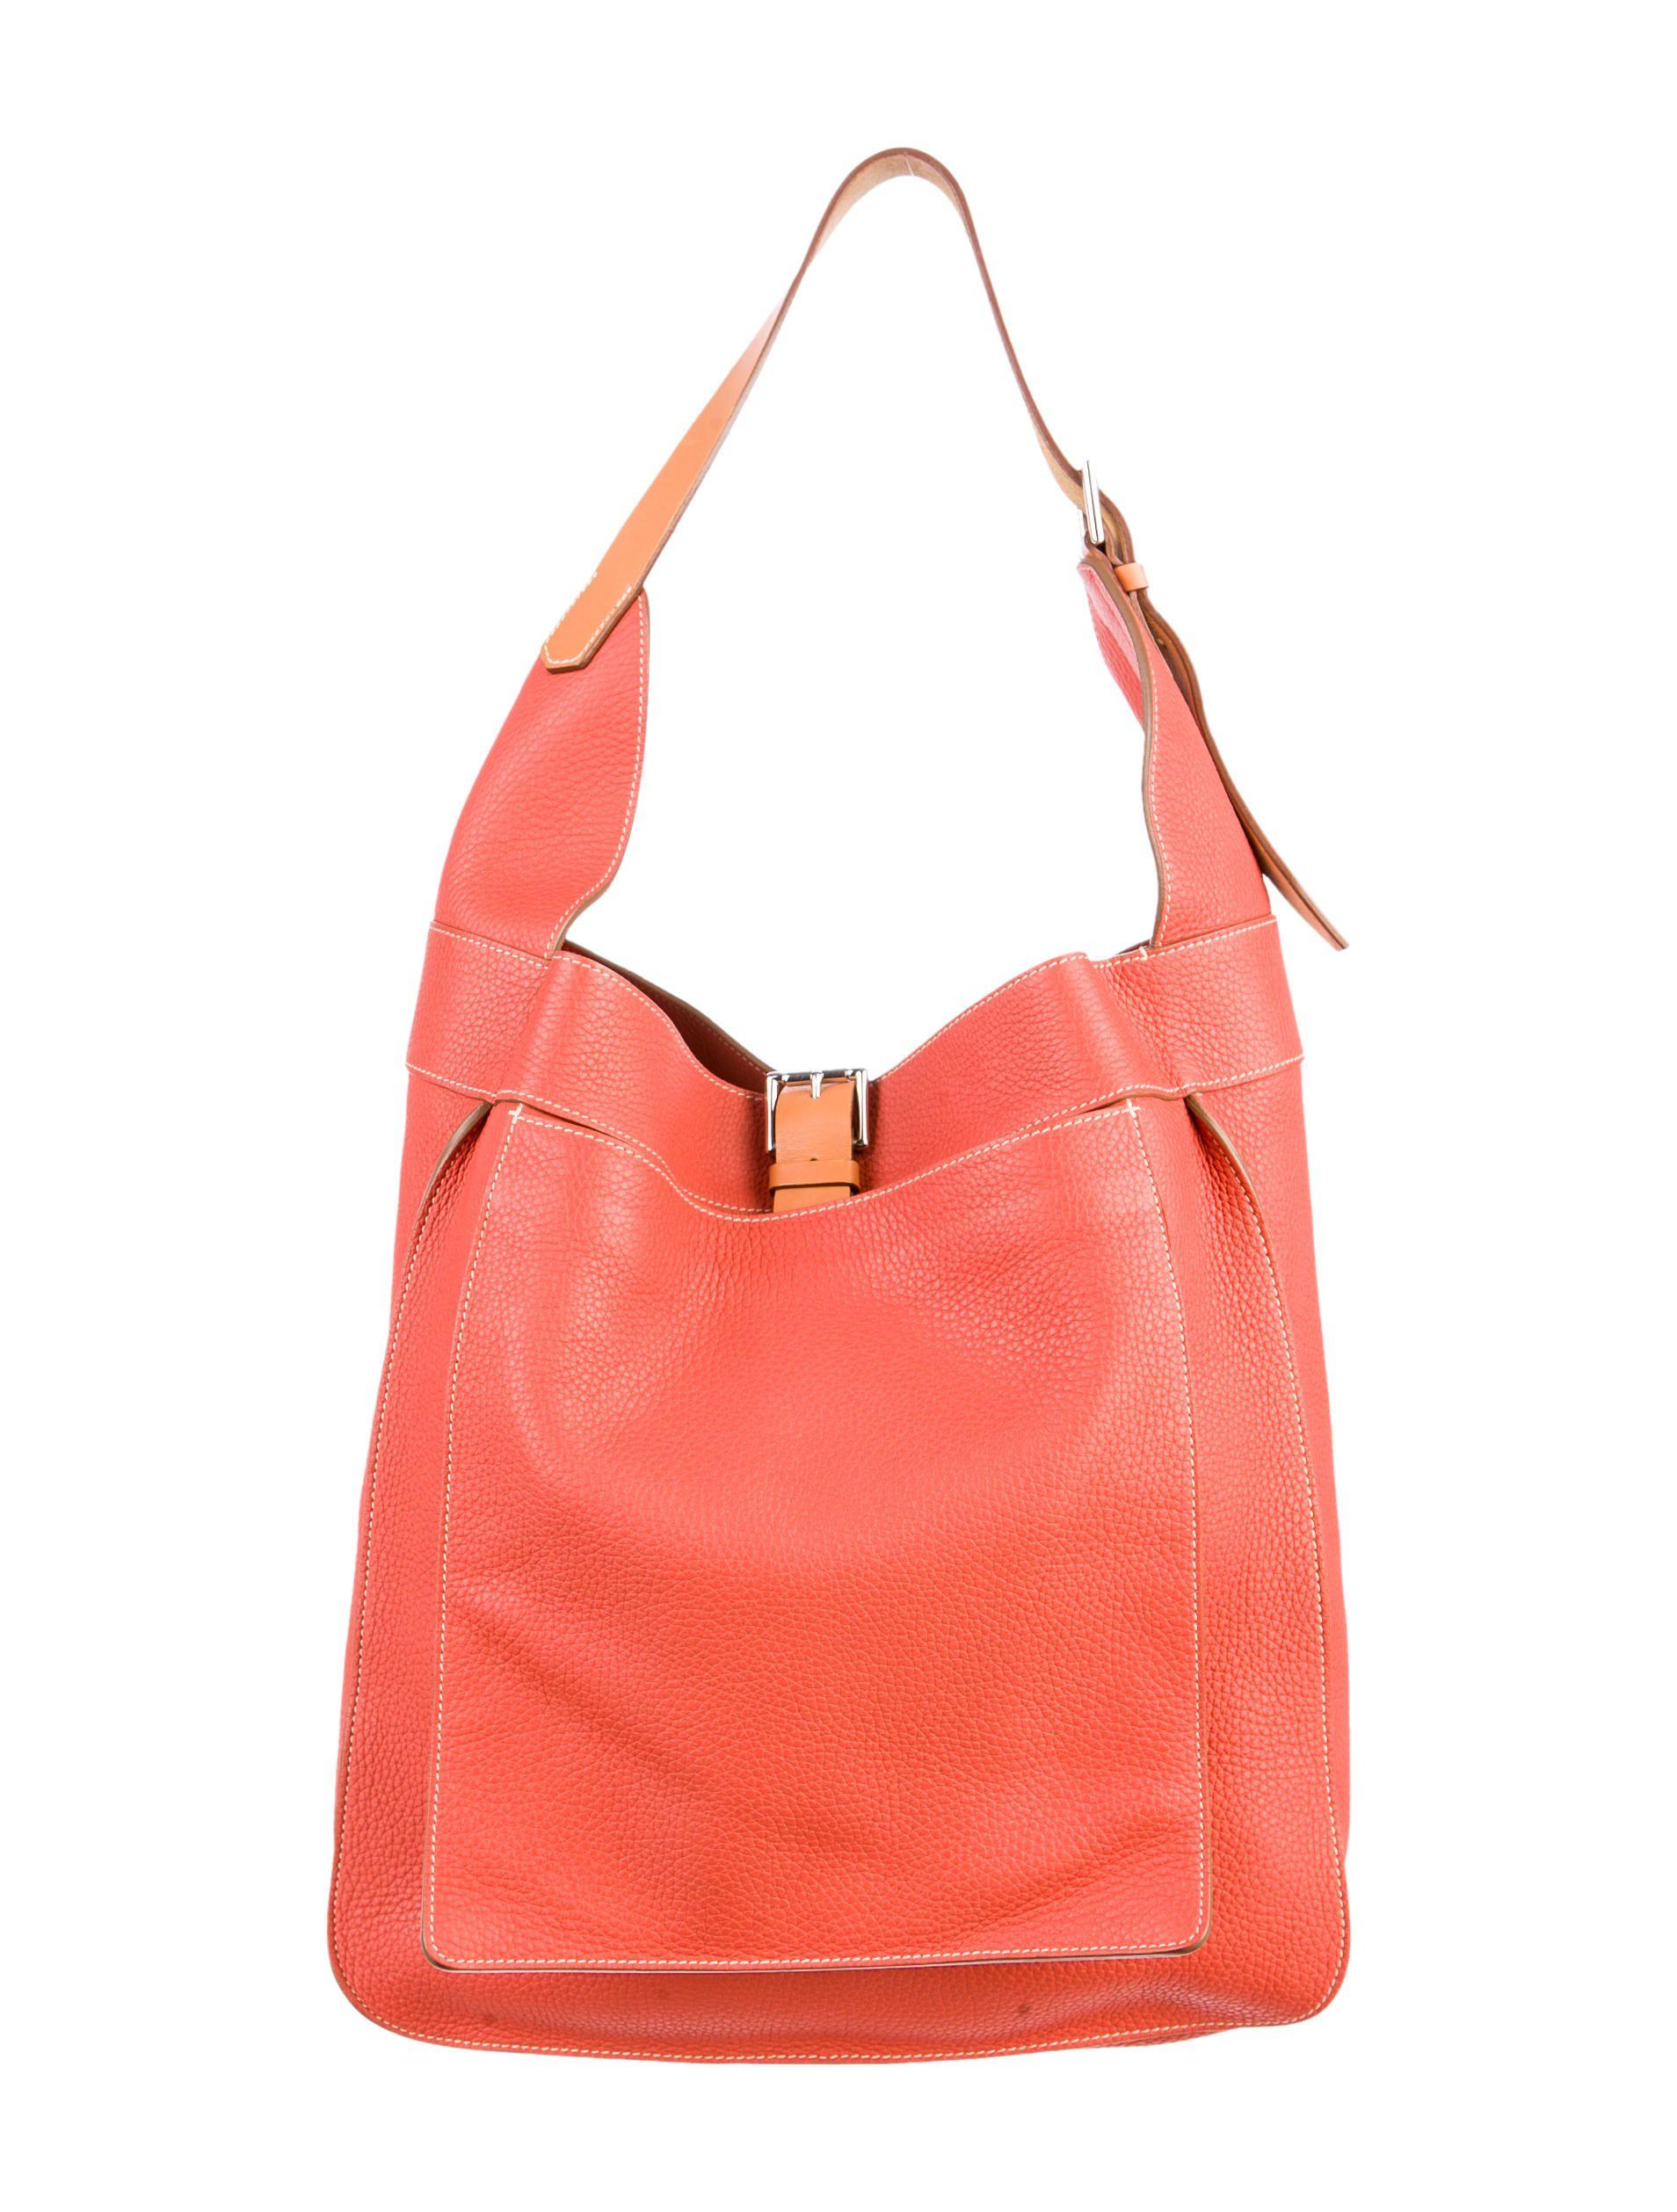 dae9e3ecf4f3 Bougainvillea clemence leather Hermès Marwari GM with palladium hardware